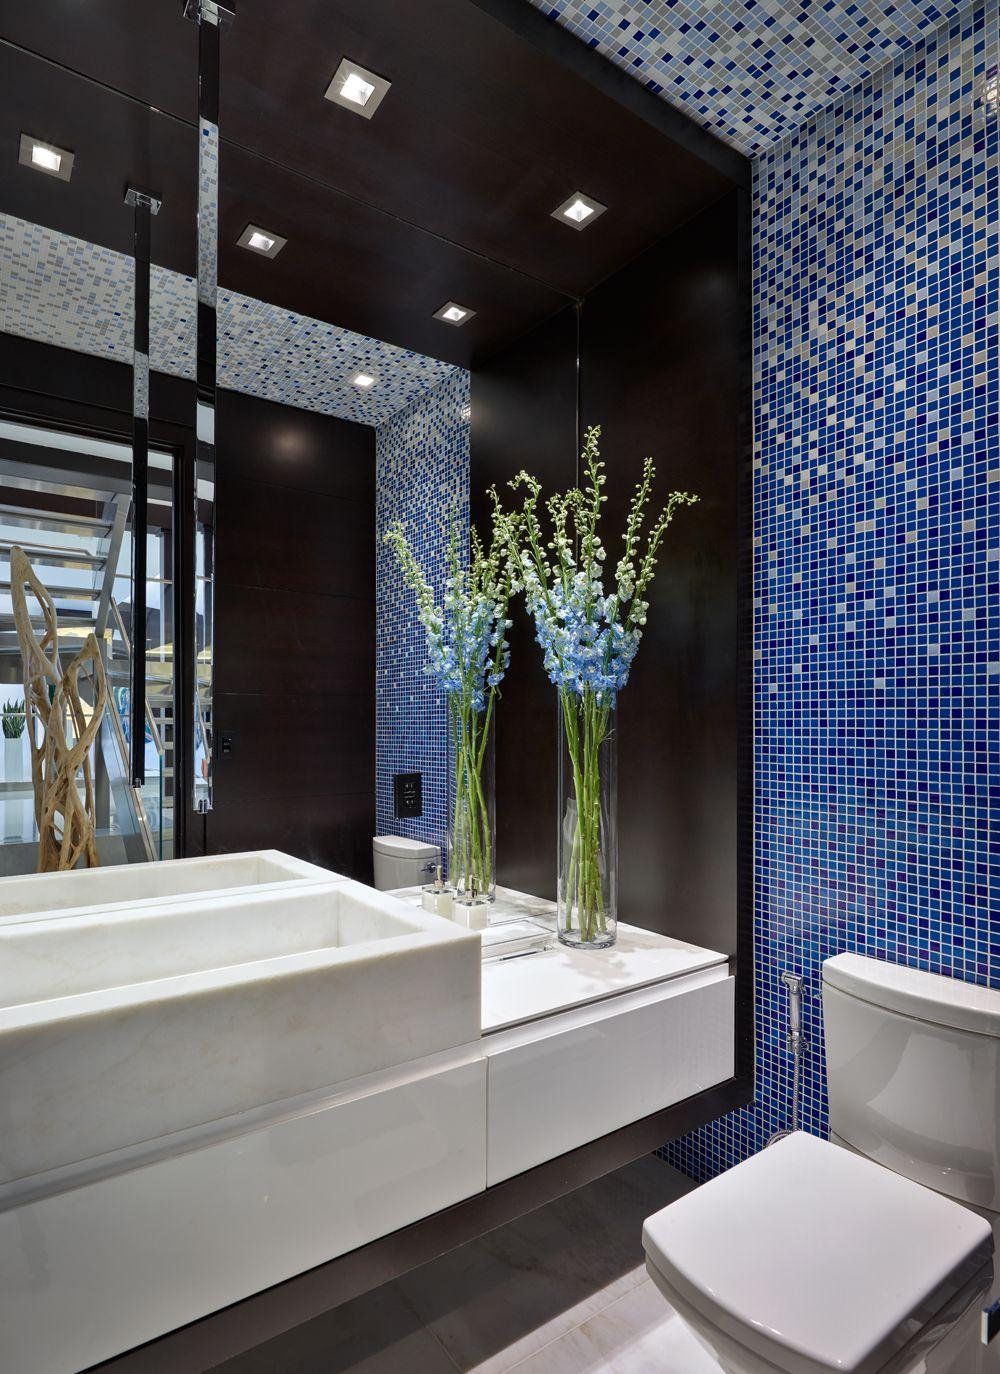 33 Bathroom Tile Design Ideas - Tiles for Floor, Showers and Walls in  Bathrooms